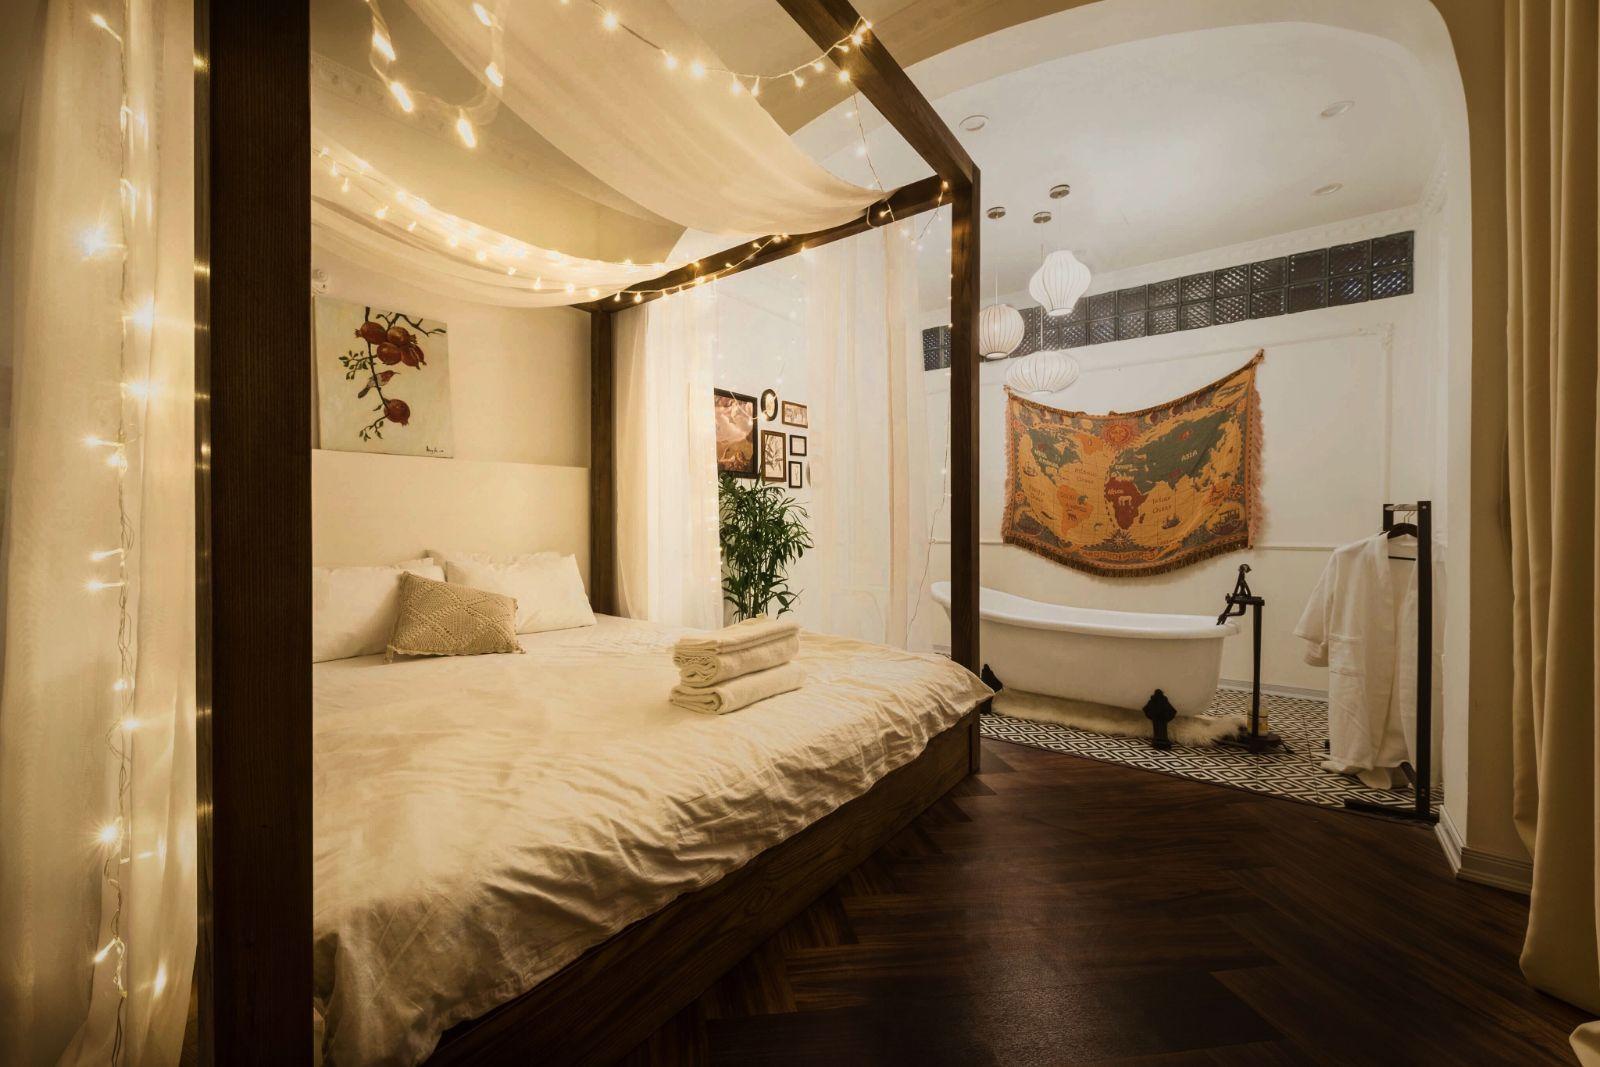 Valse Room   Chloe And Leo Boutique Trang Tien  Wst